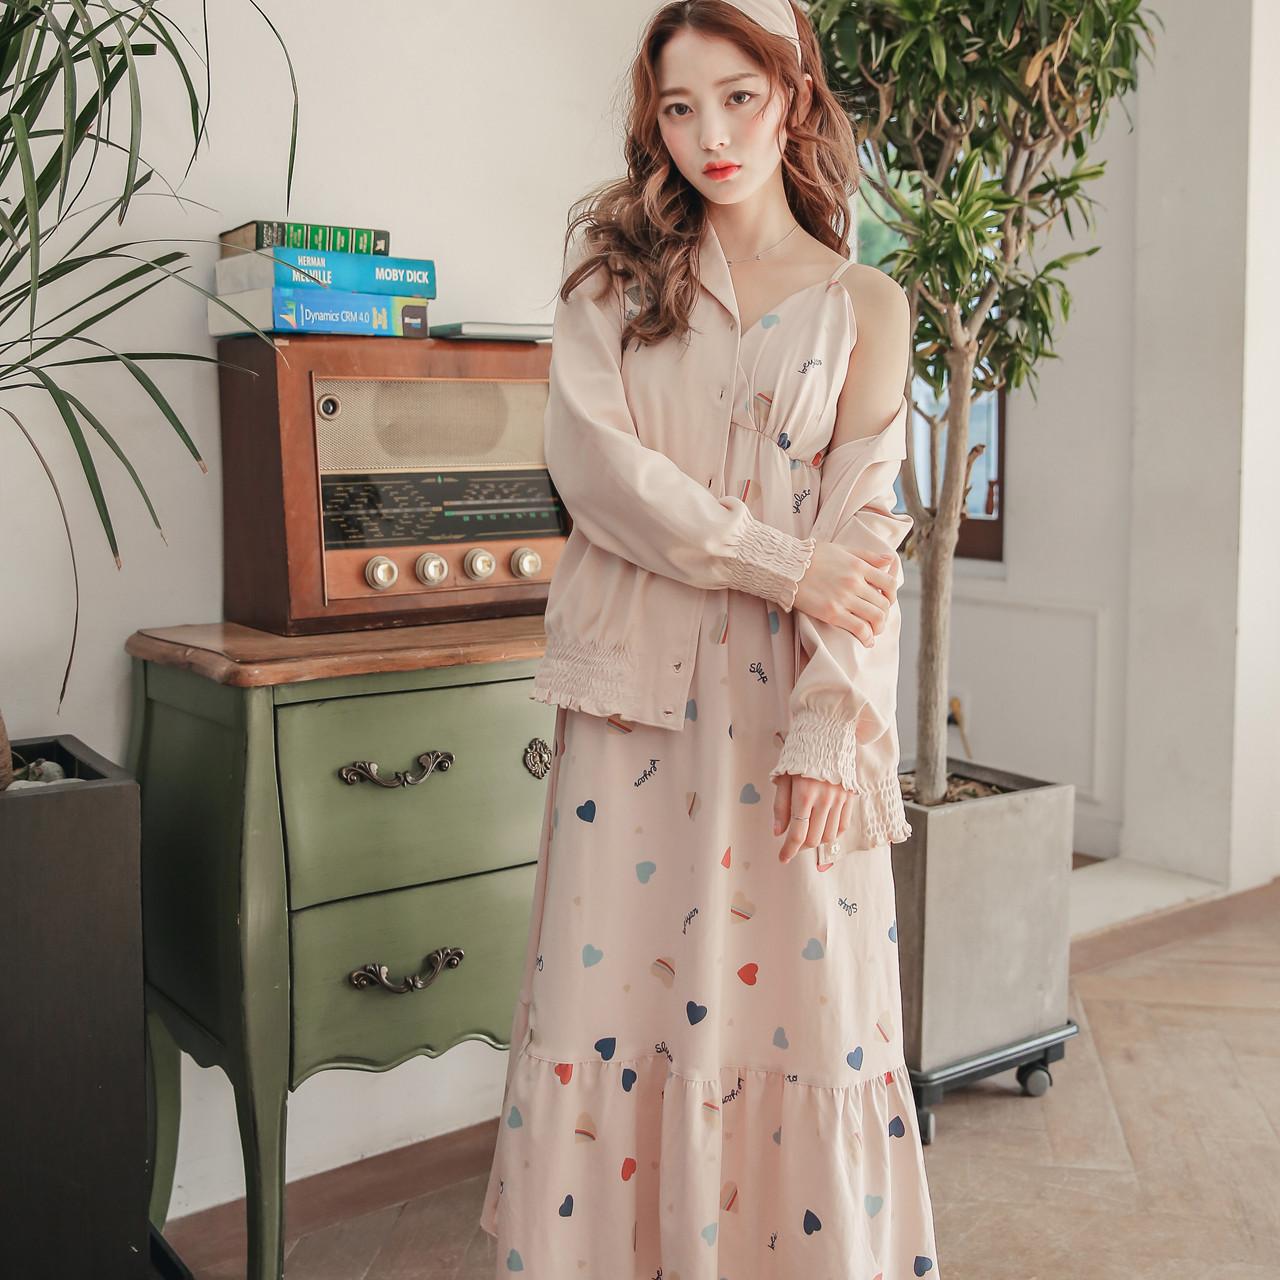 Lmsj孕妇睡裙韩版产后长裙月子服两件套